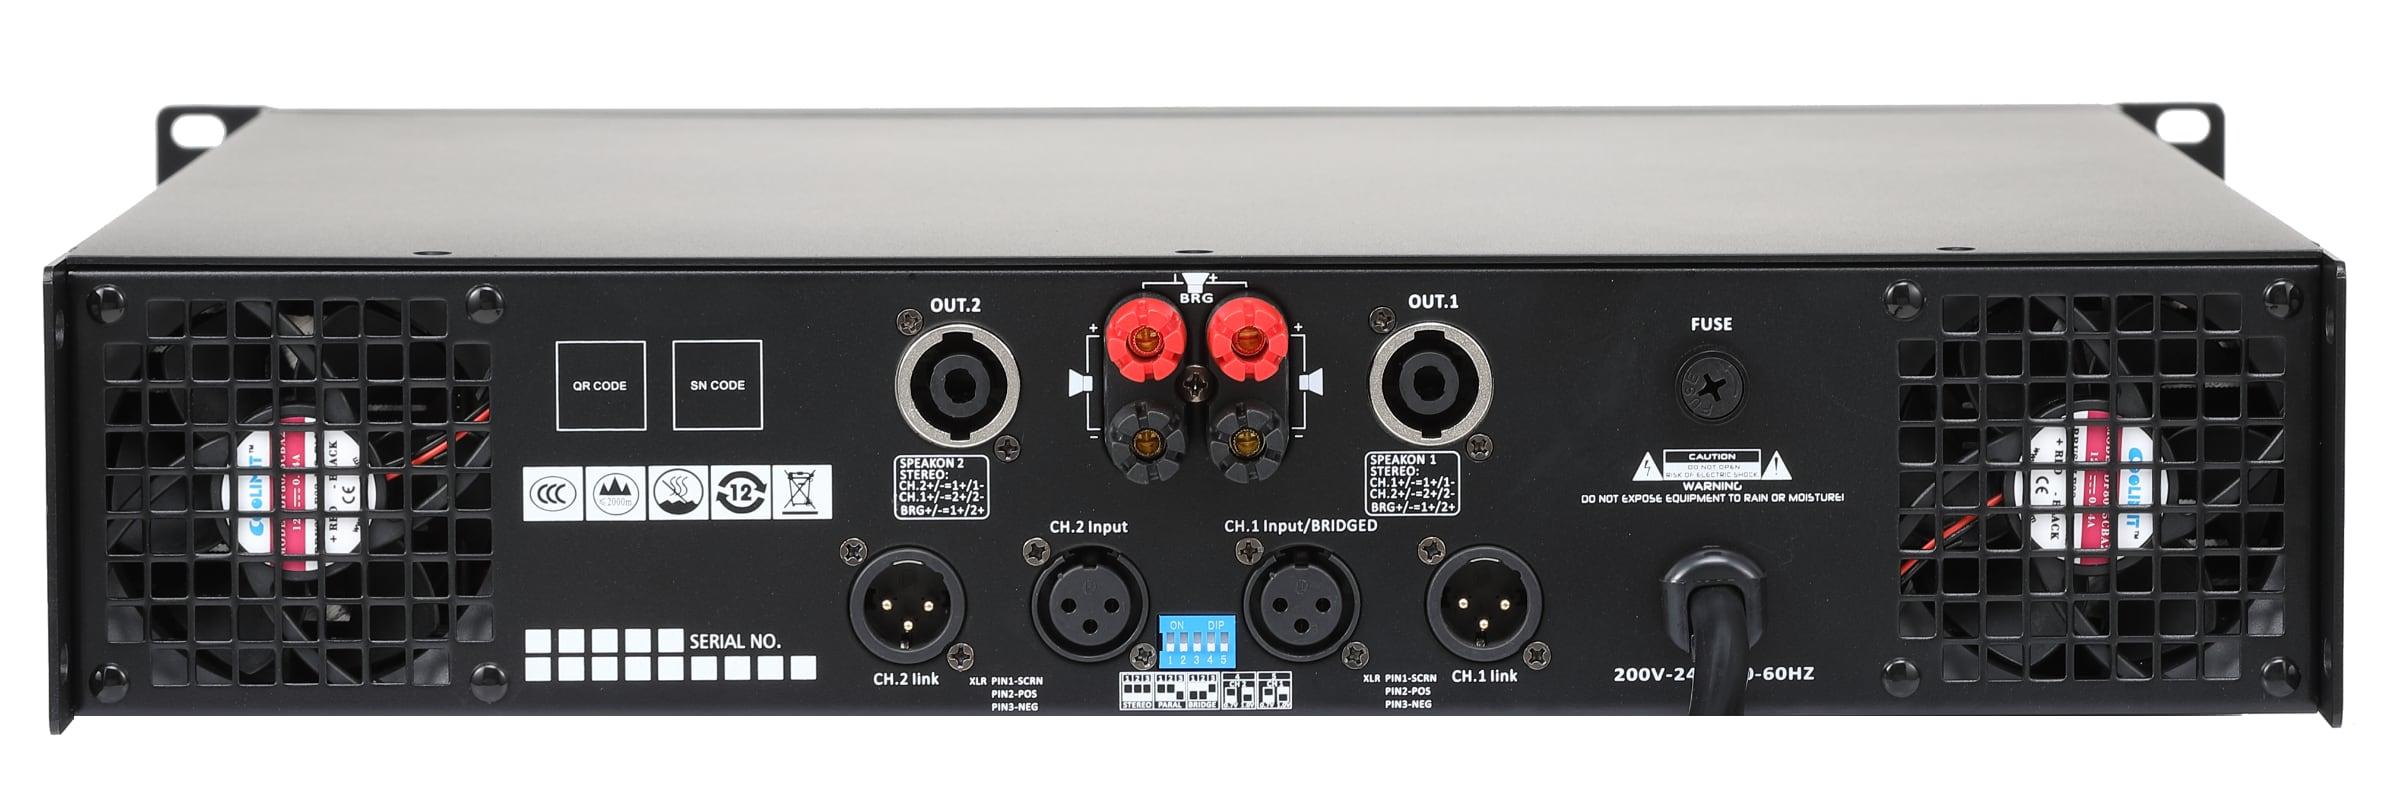 Công suất AAP TD-10002